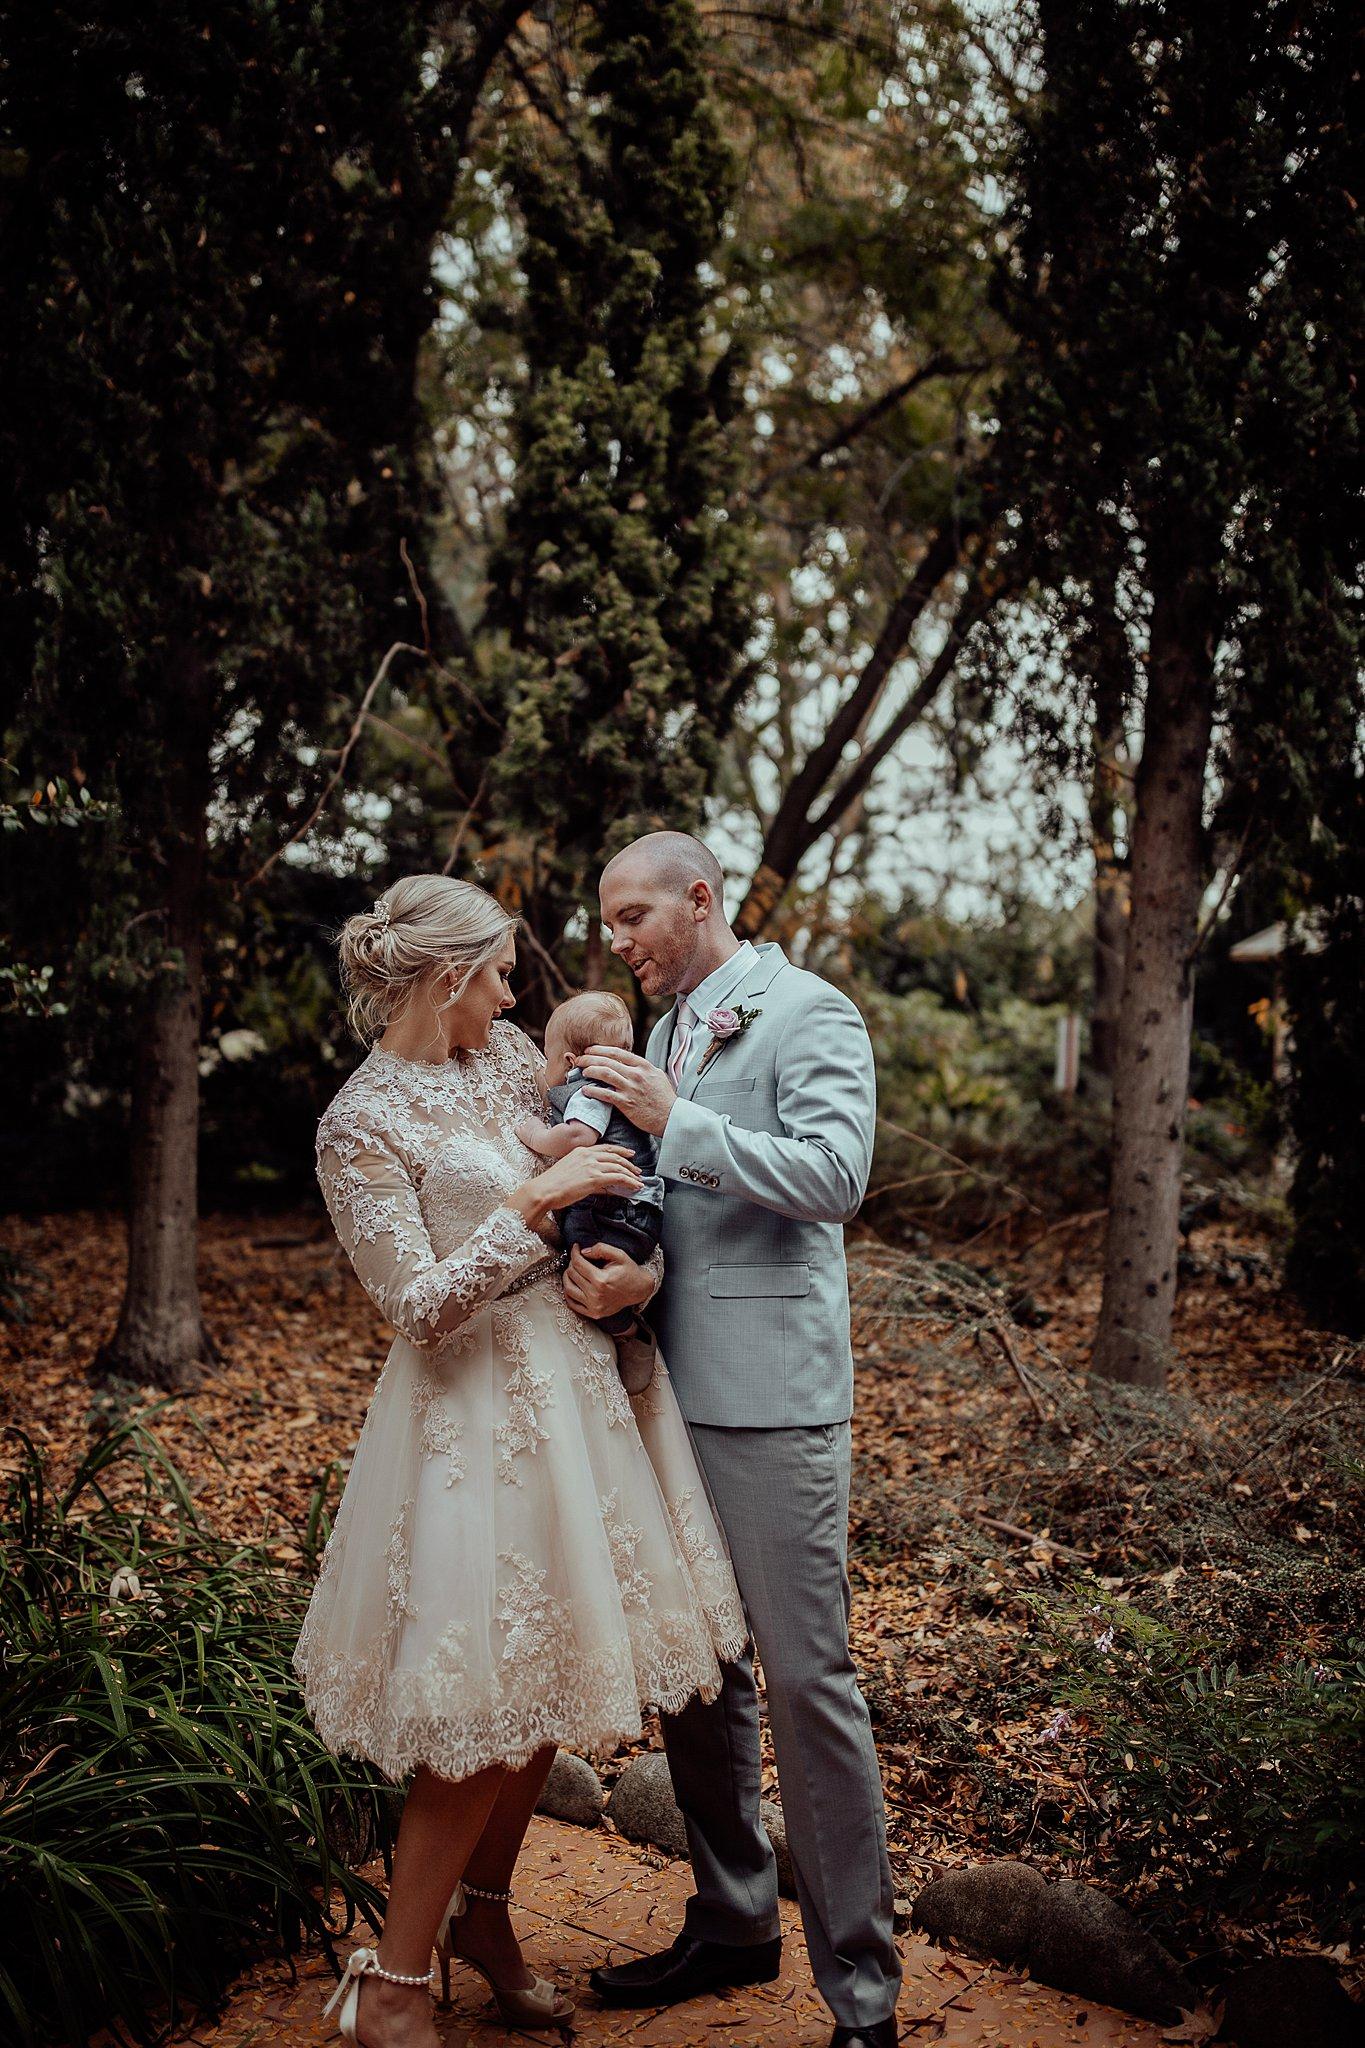 mickalathomas_puremacphotography_weddingphotographer_couplephotographer_Sheppartonphotographer_3411.jpg